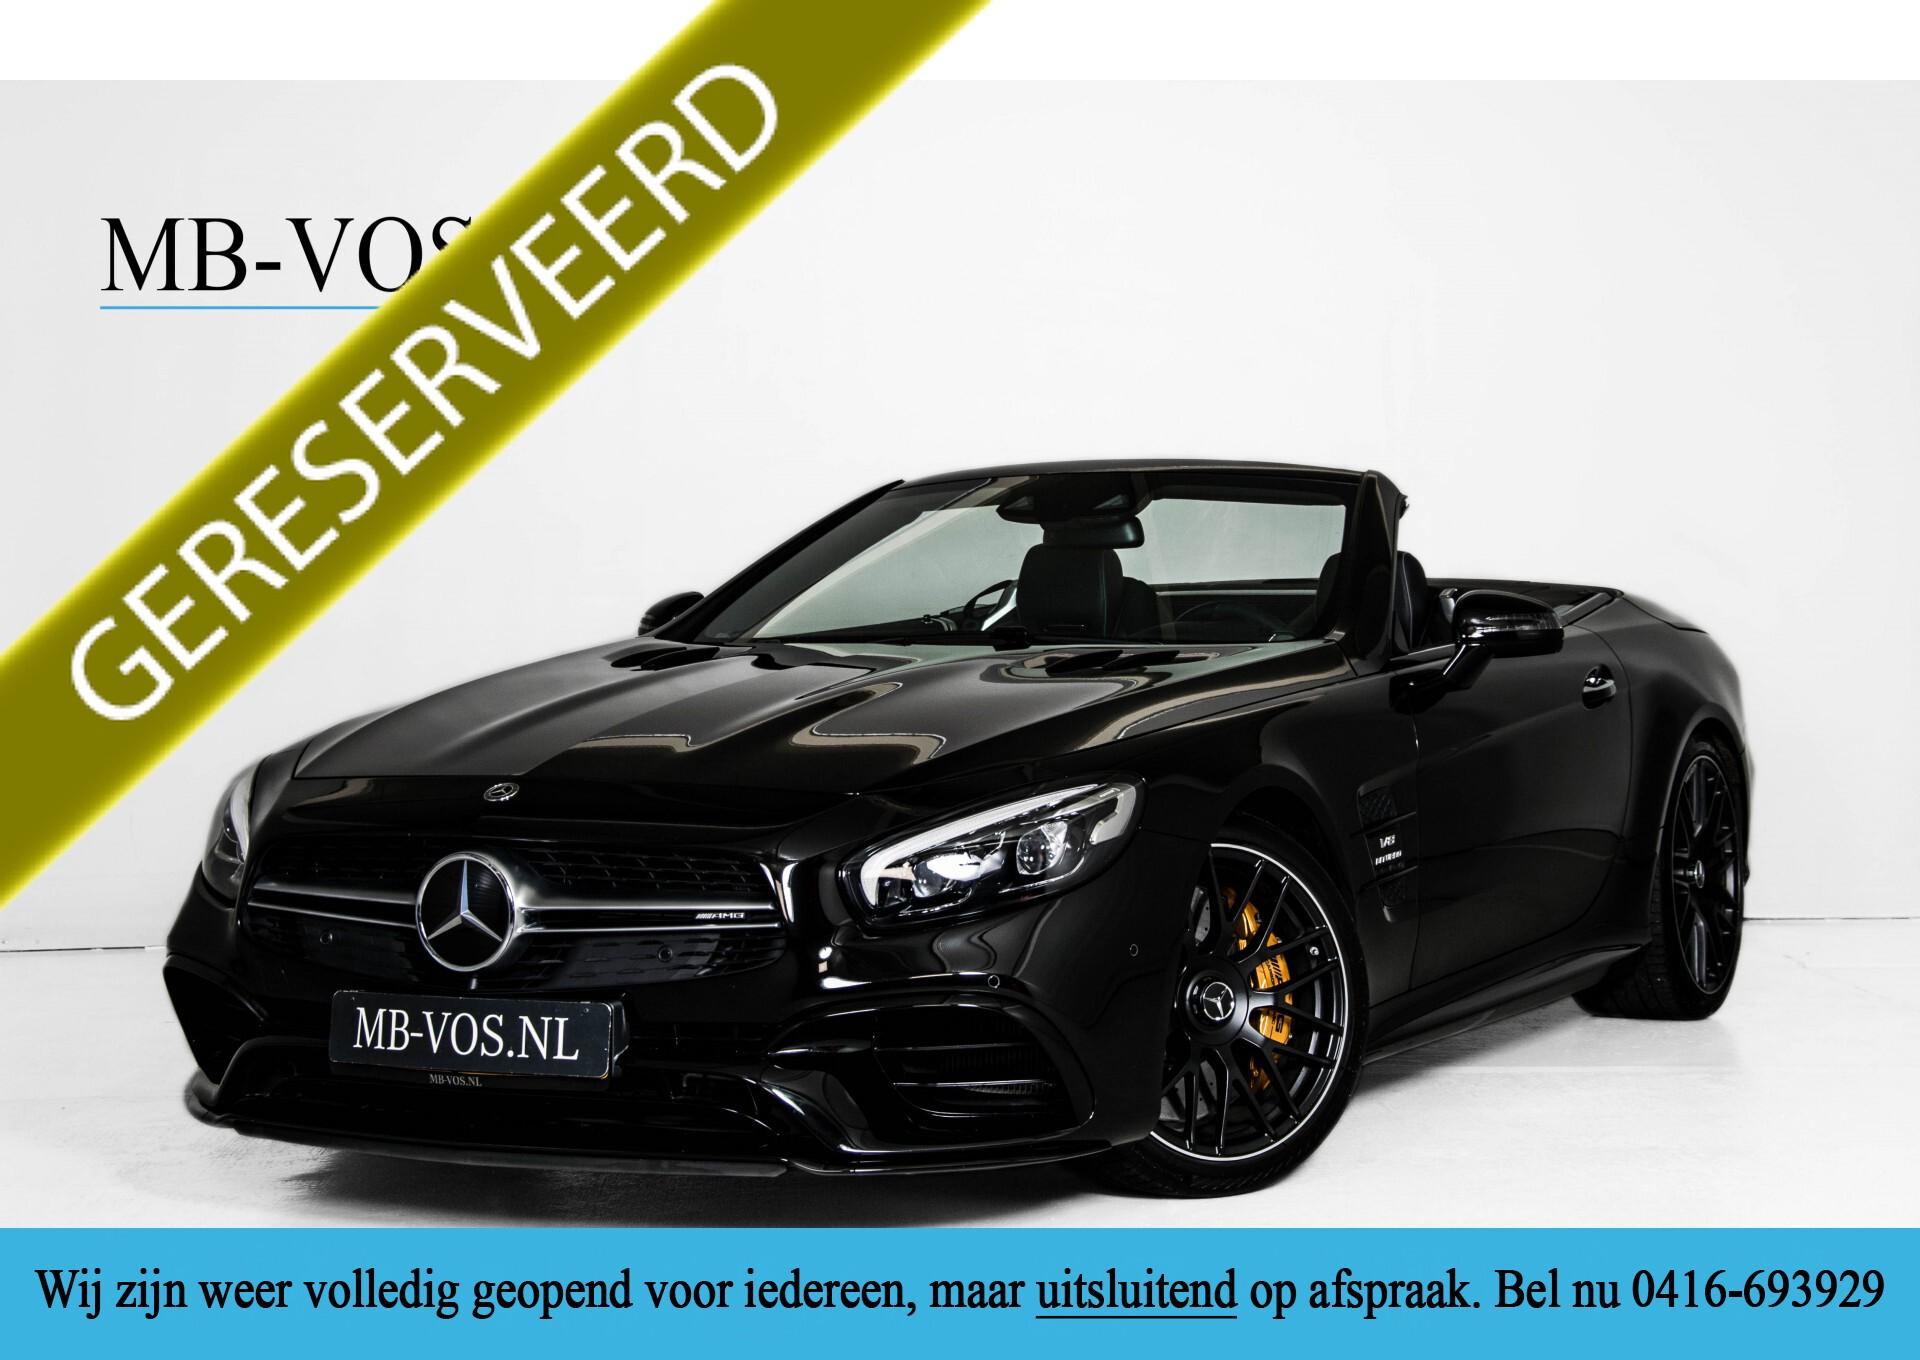 Mercedes-Benz SL-Klasse 63 AMG Keramisch/Bang & Olufsen/Designo/Carbon/Drivers Package Aut7 Foto 1